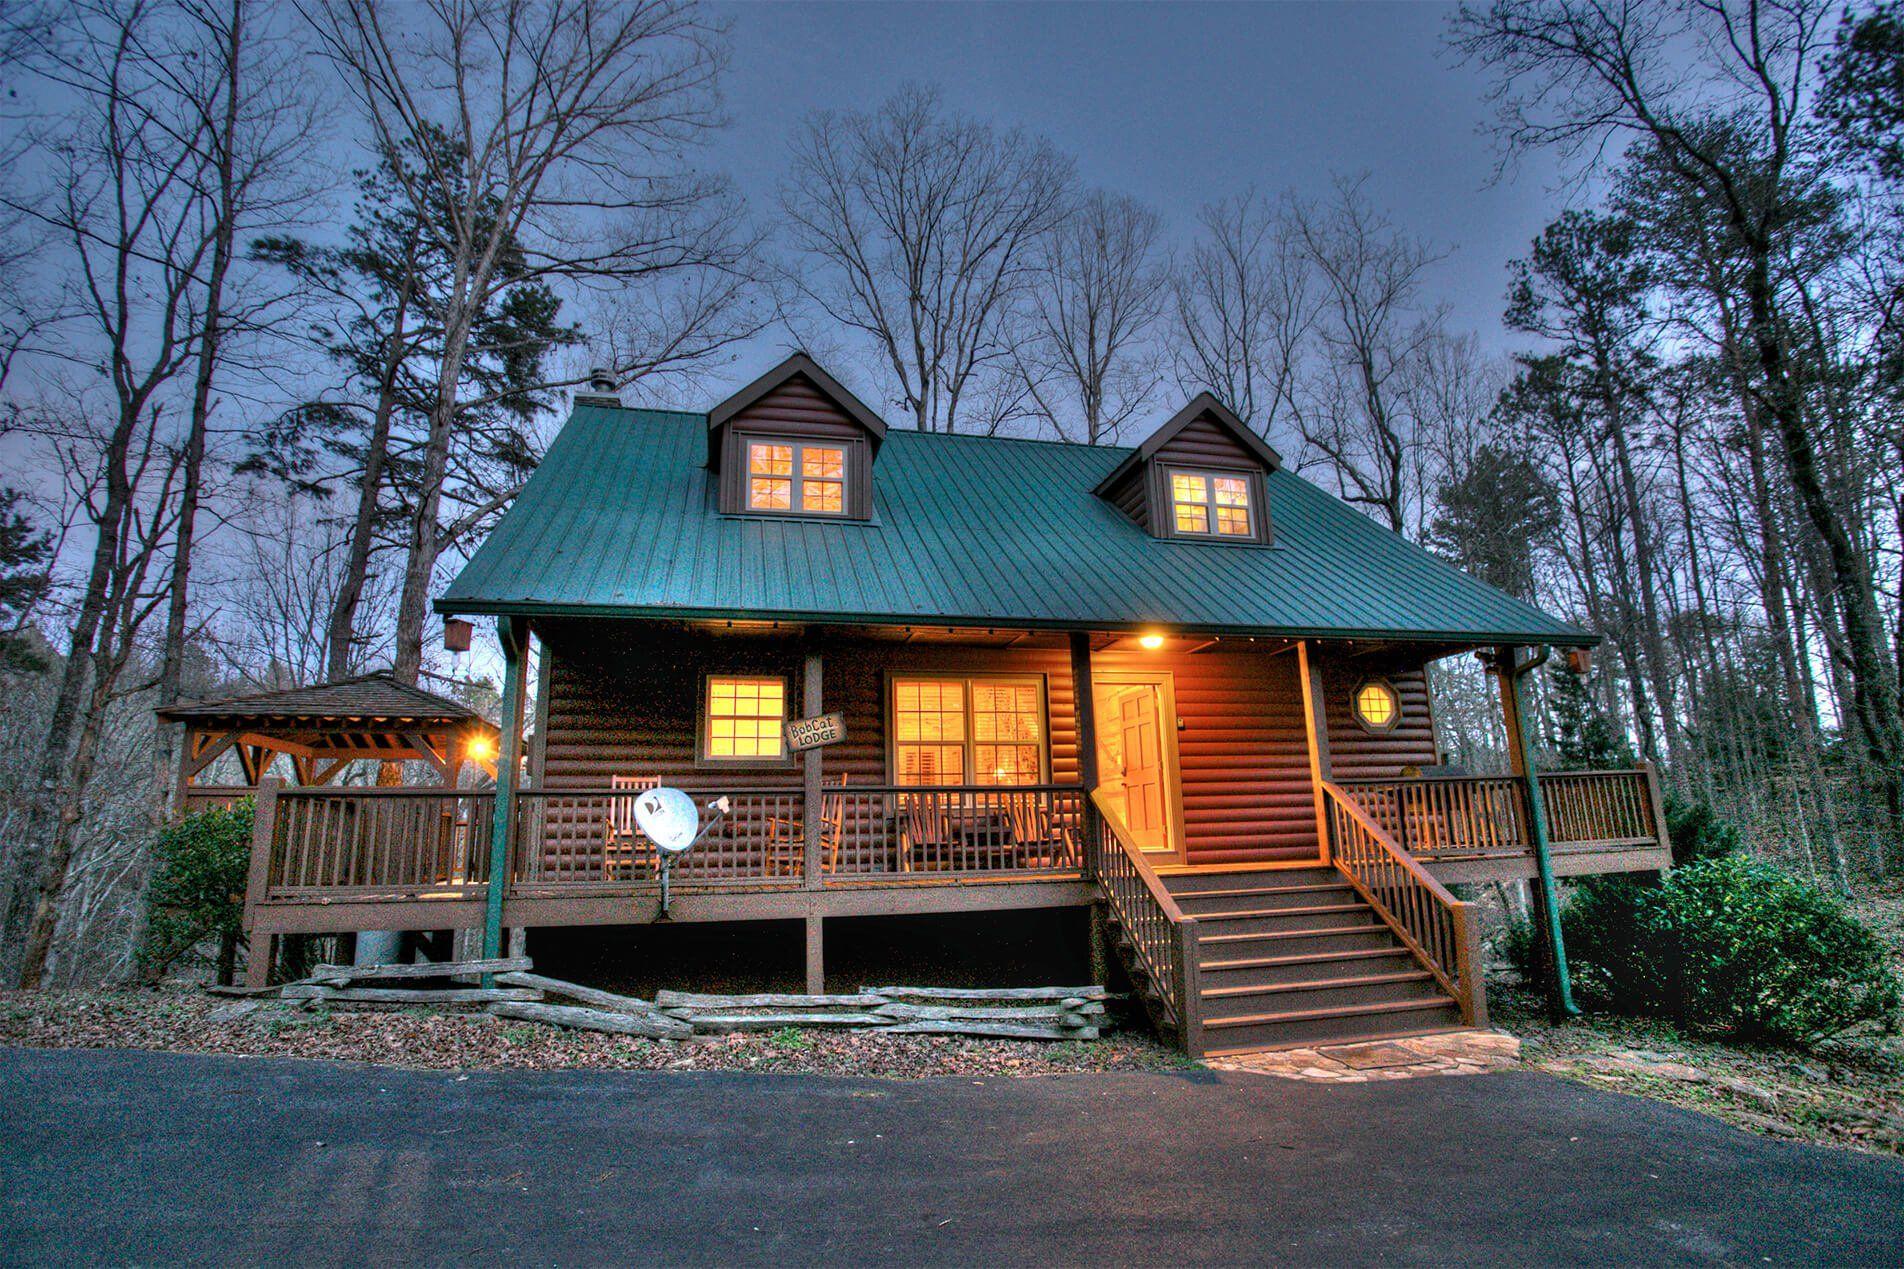 lodge cabin in georgia cabins bobcat family near pin rental ga helen rentals